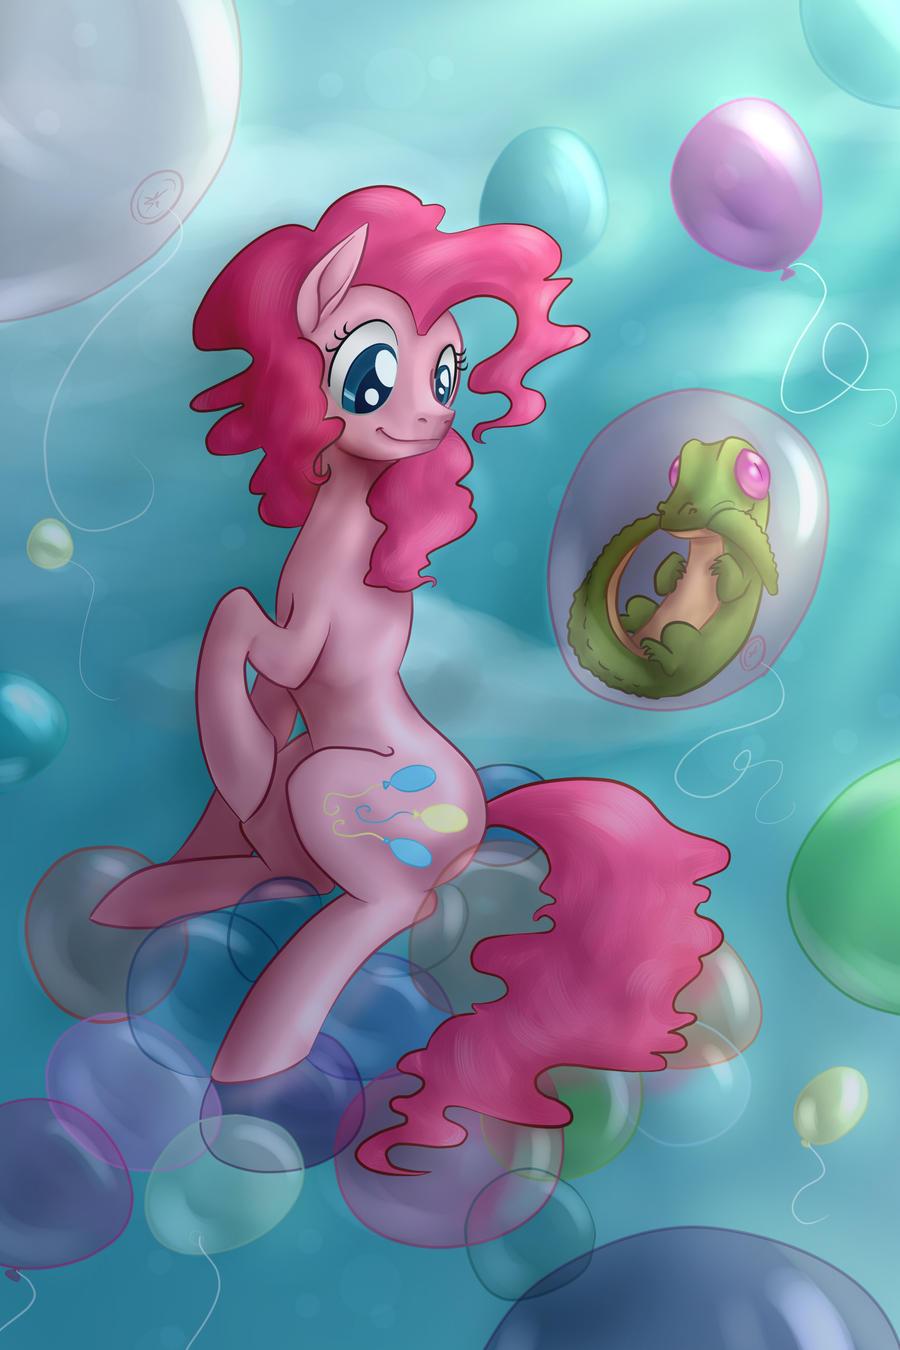 Balloon Party by Tzelly-El